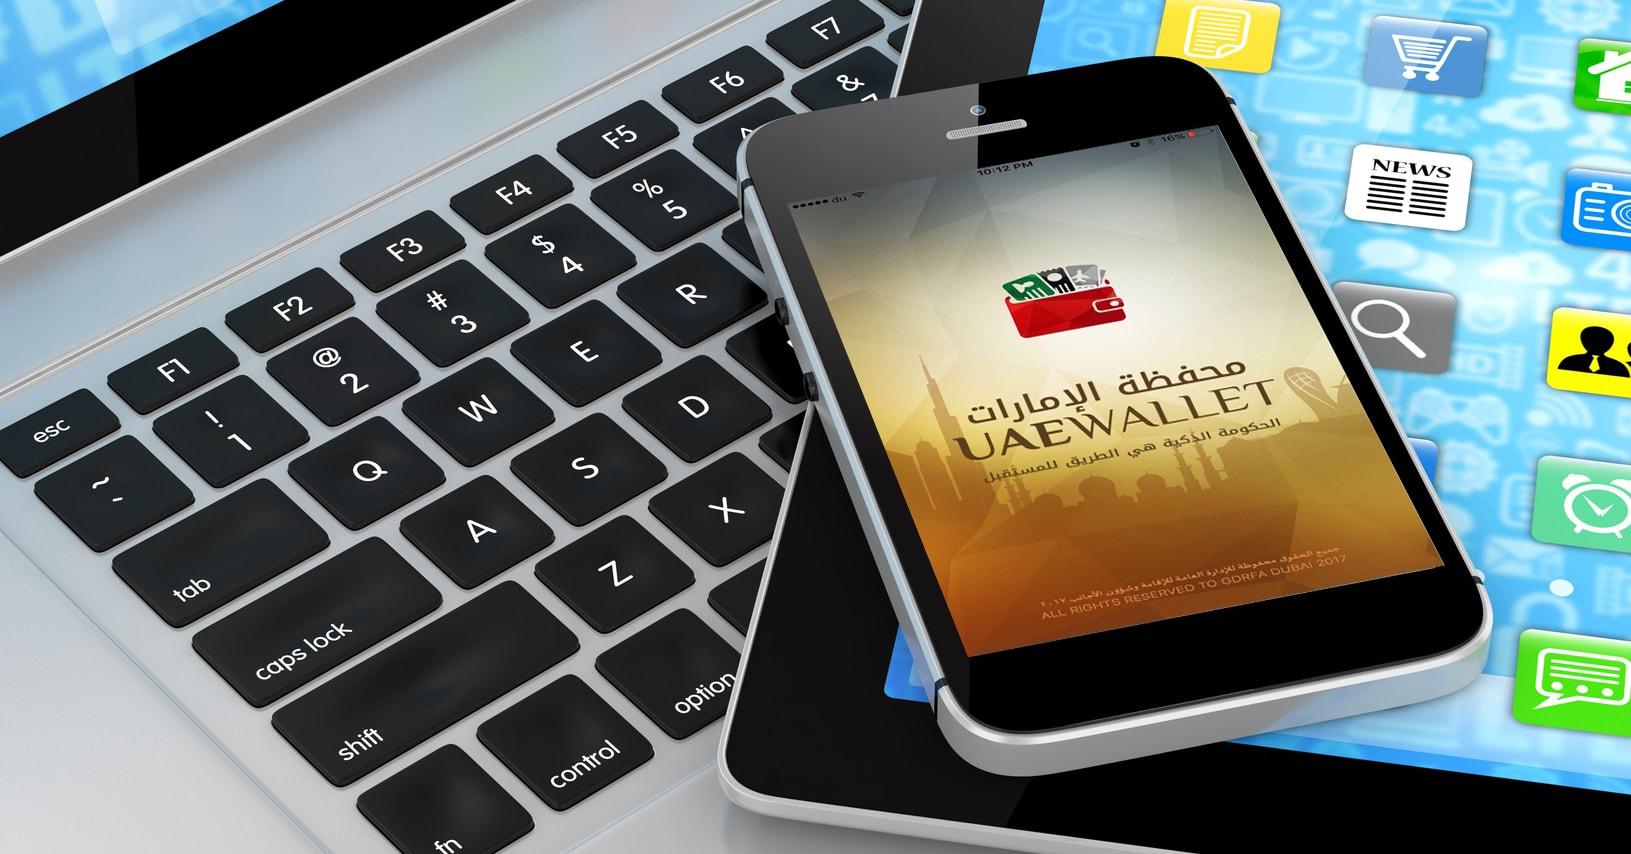 uaewallet Dubai airport passport app